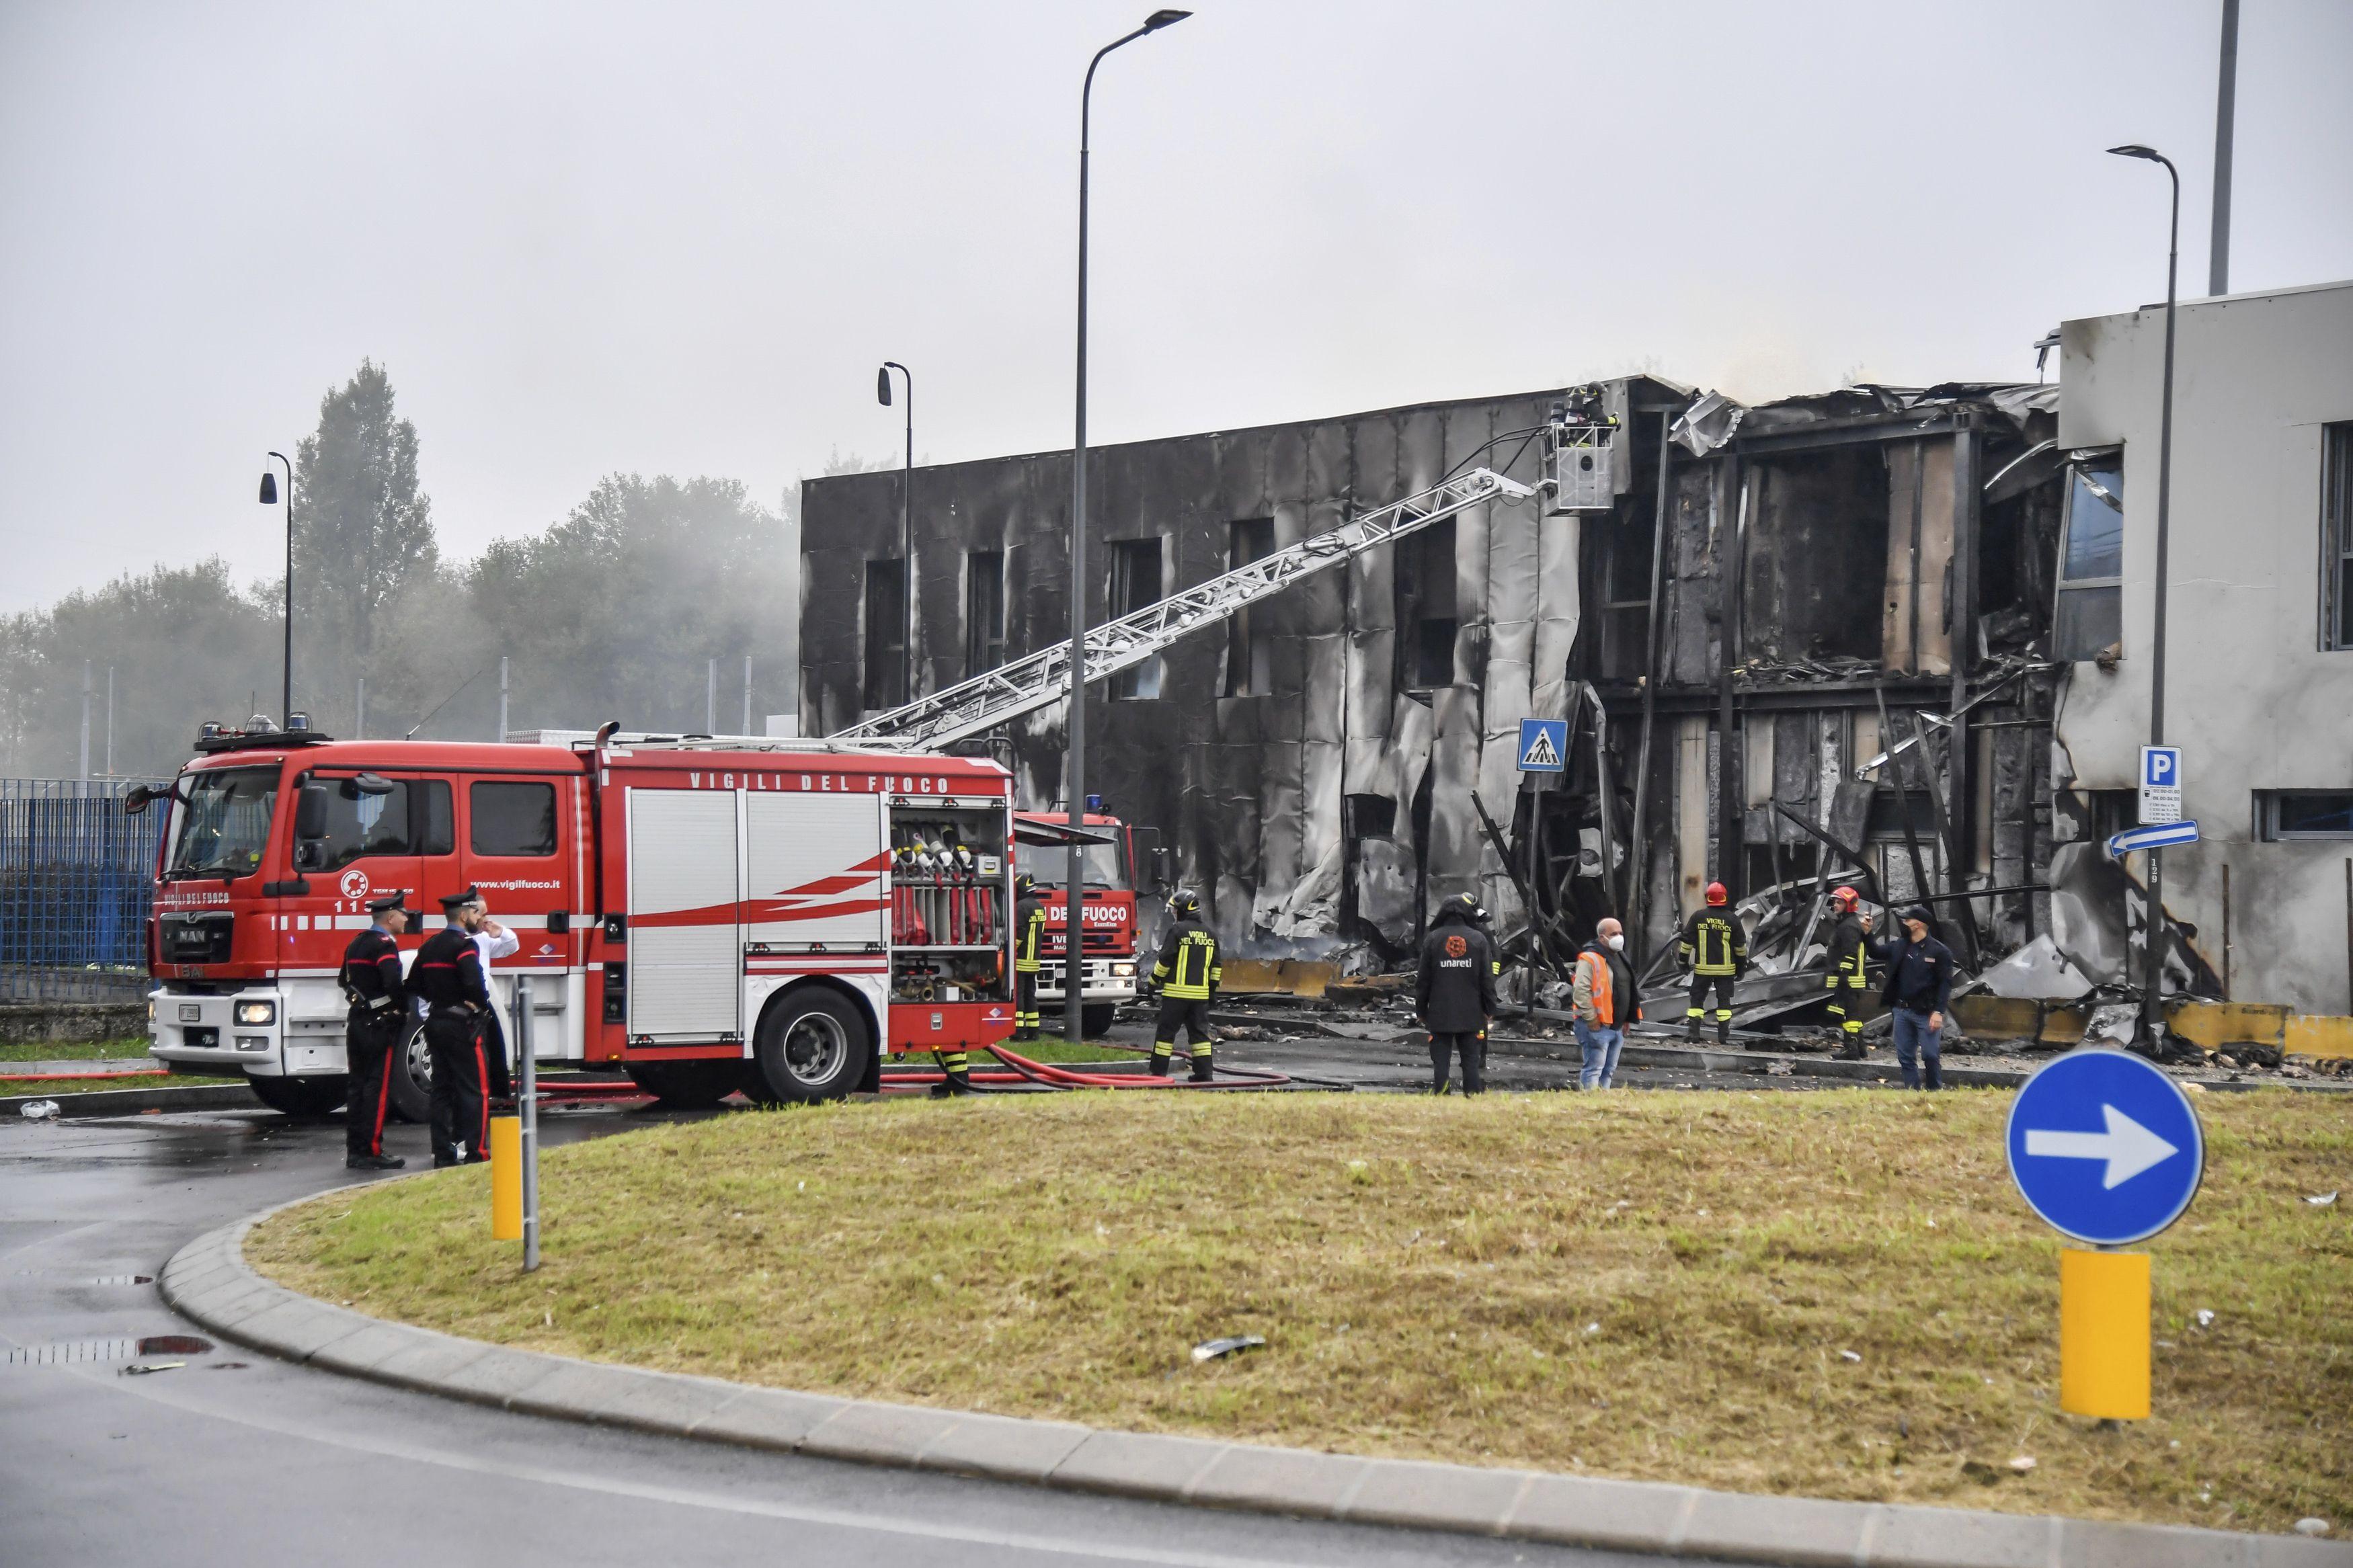 avioneta se estrella contra edificio en italia; mueren 8